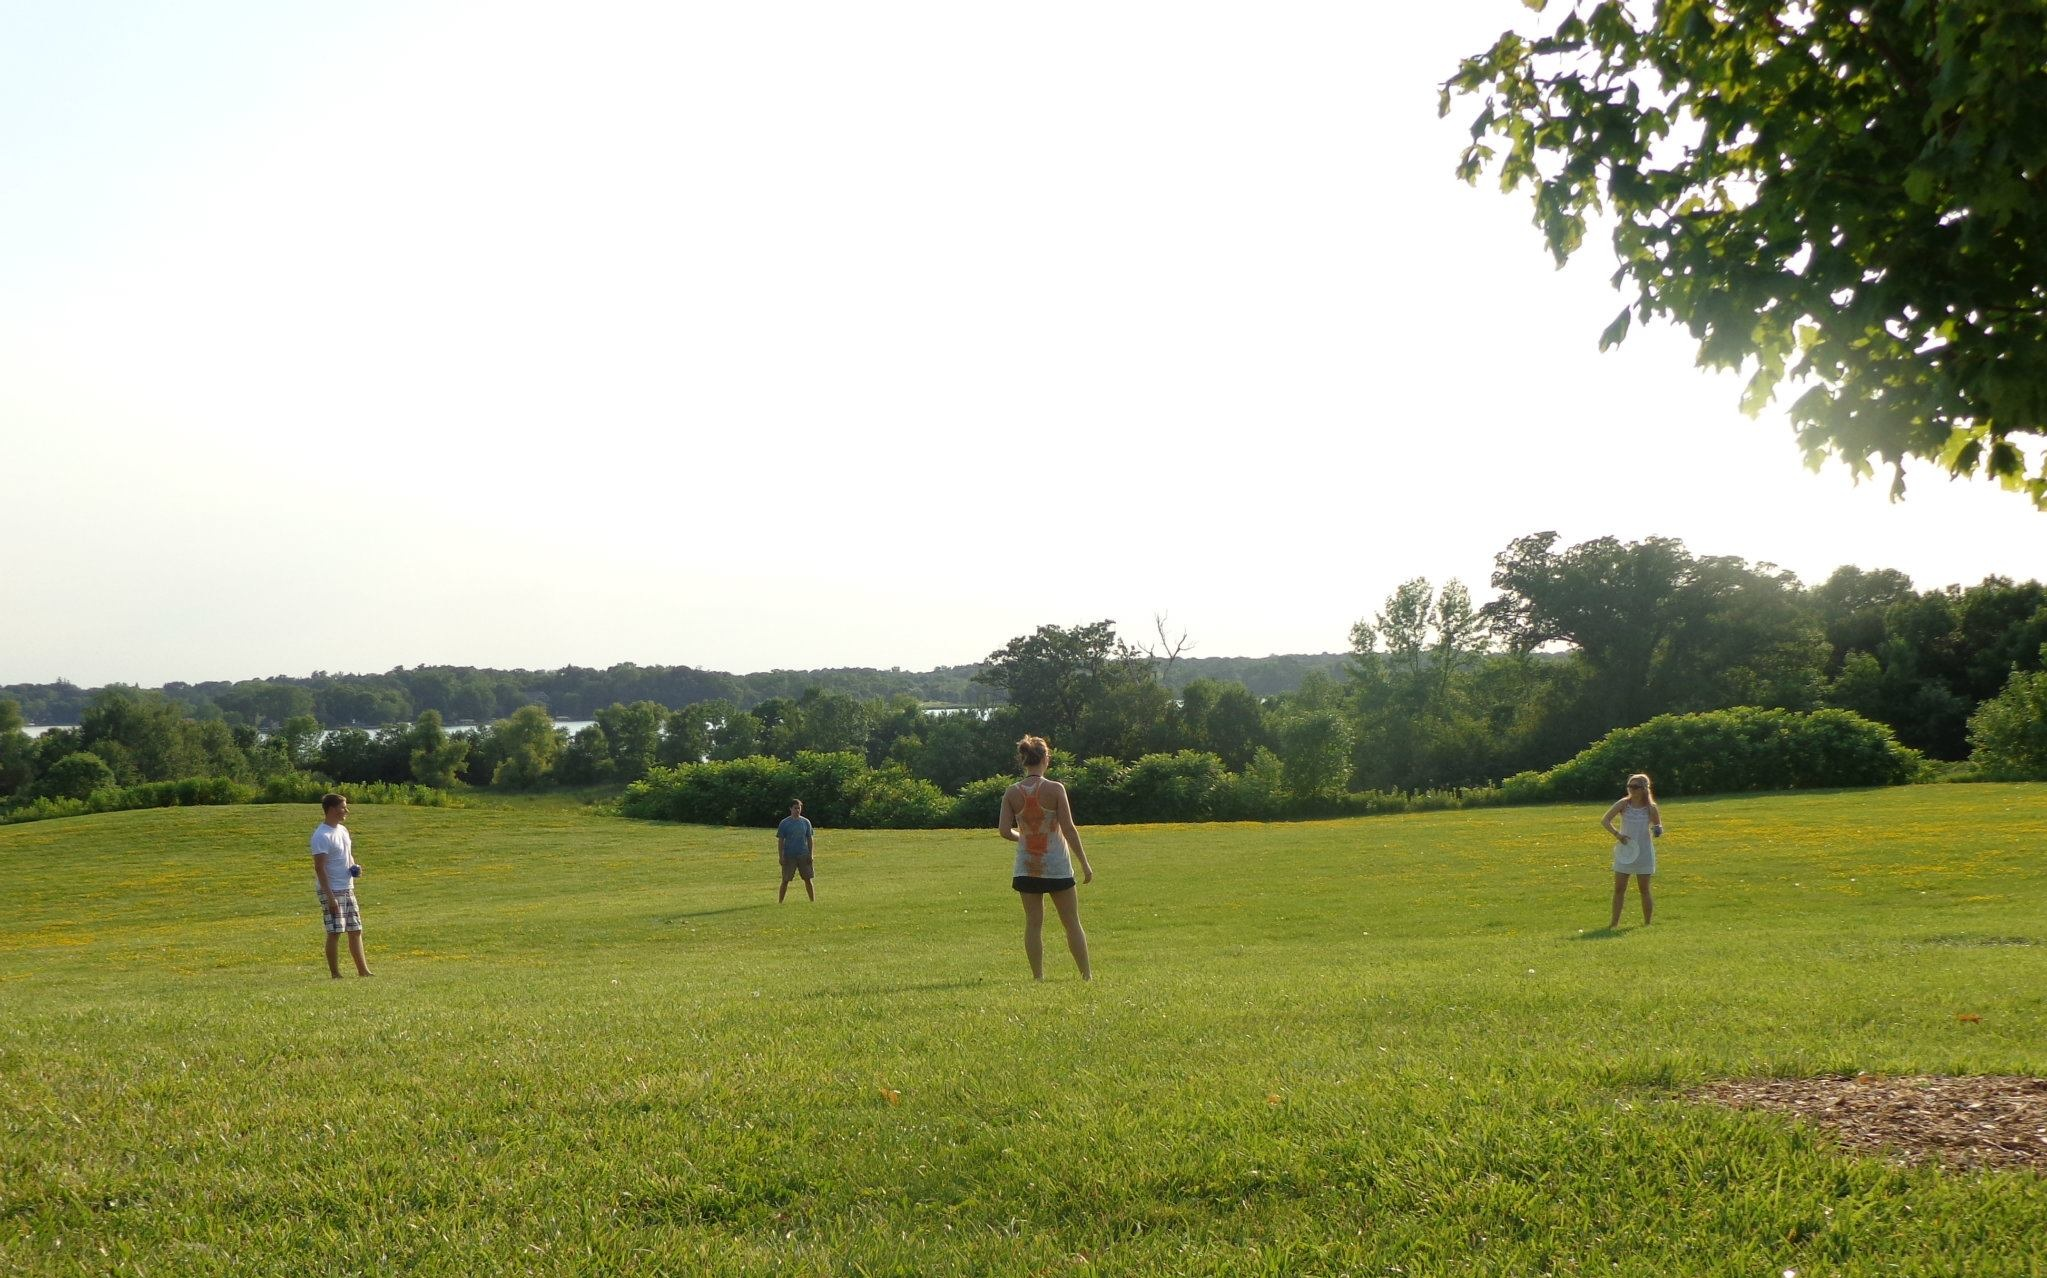 Summer in Minnesota. Circa 2011.